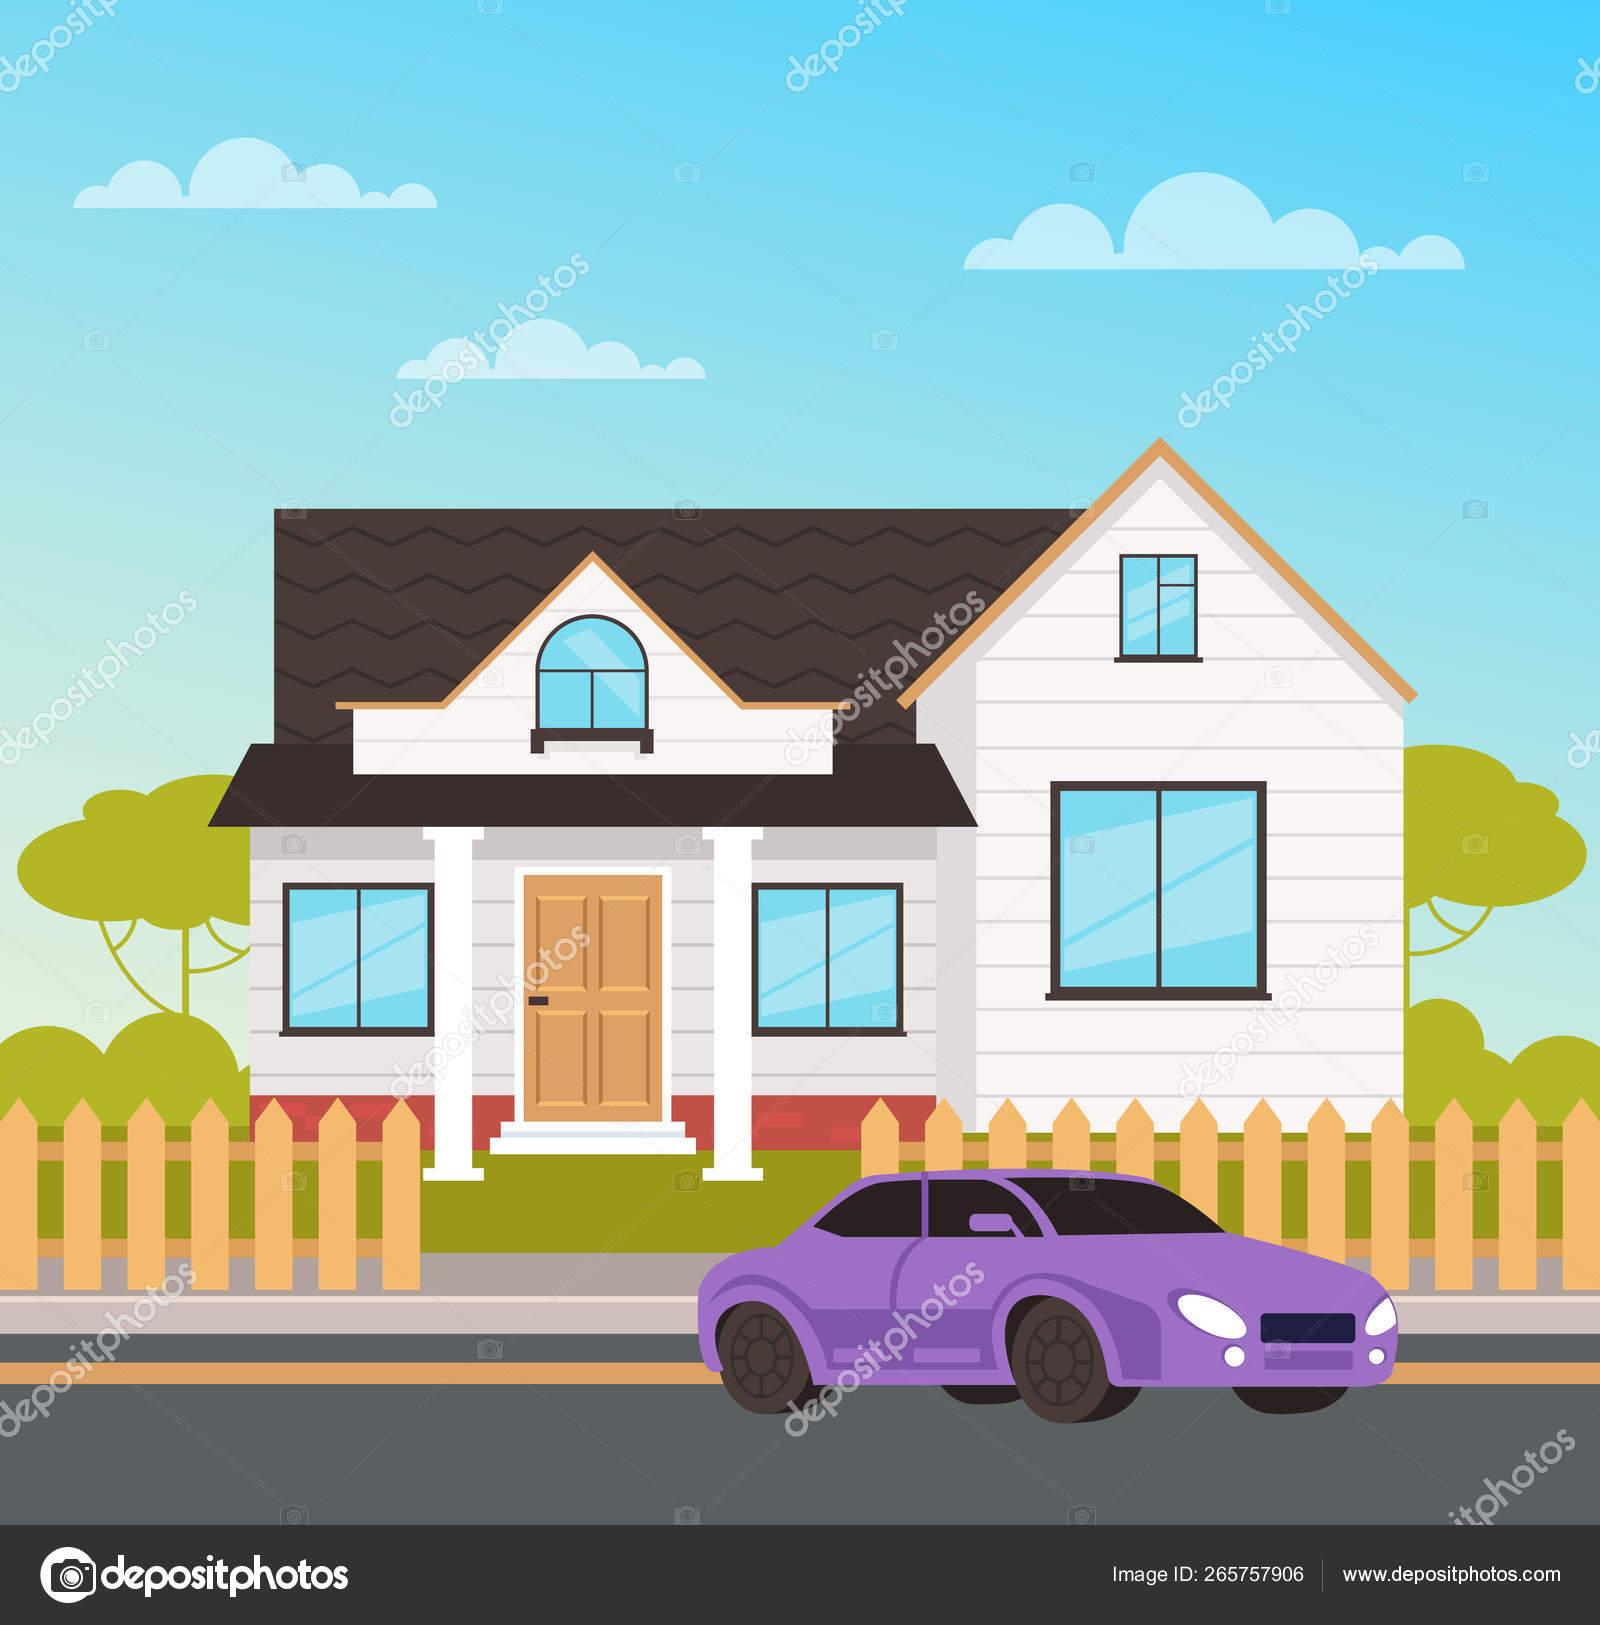 Big Family House Cottage Concept Vector Design Flat Graphic Cartoon Stock Vector C Prettyvectors 265757906